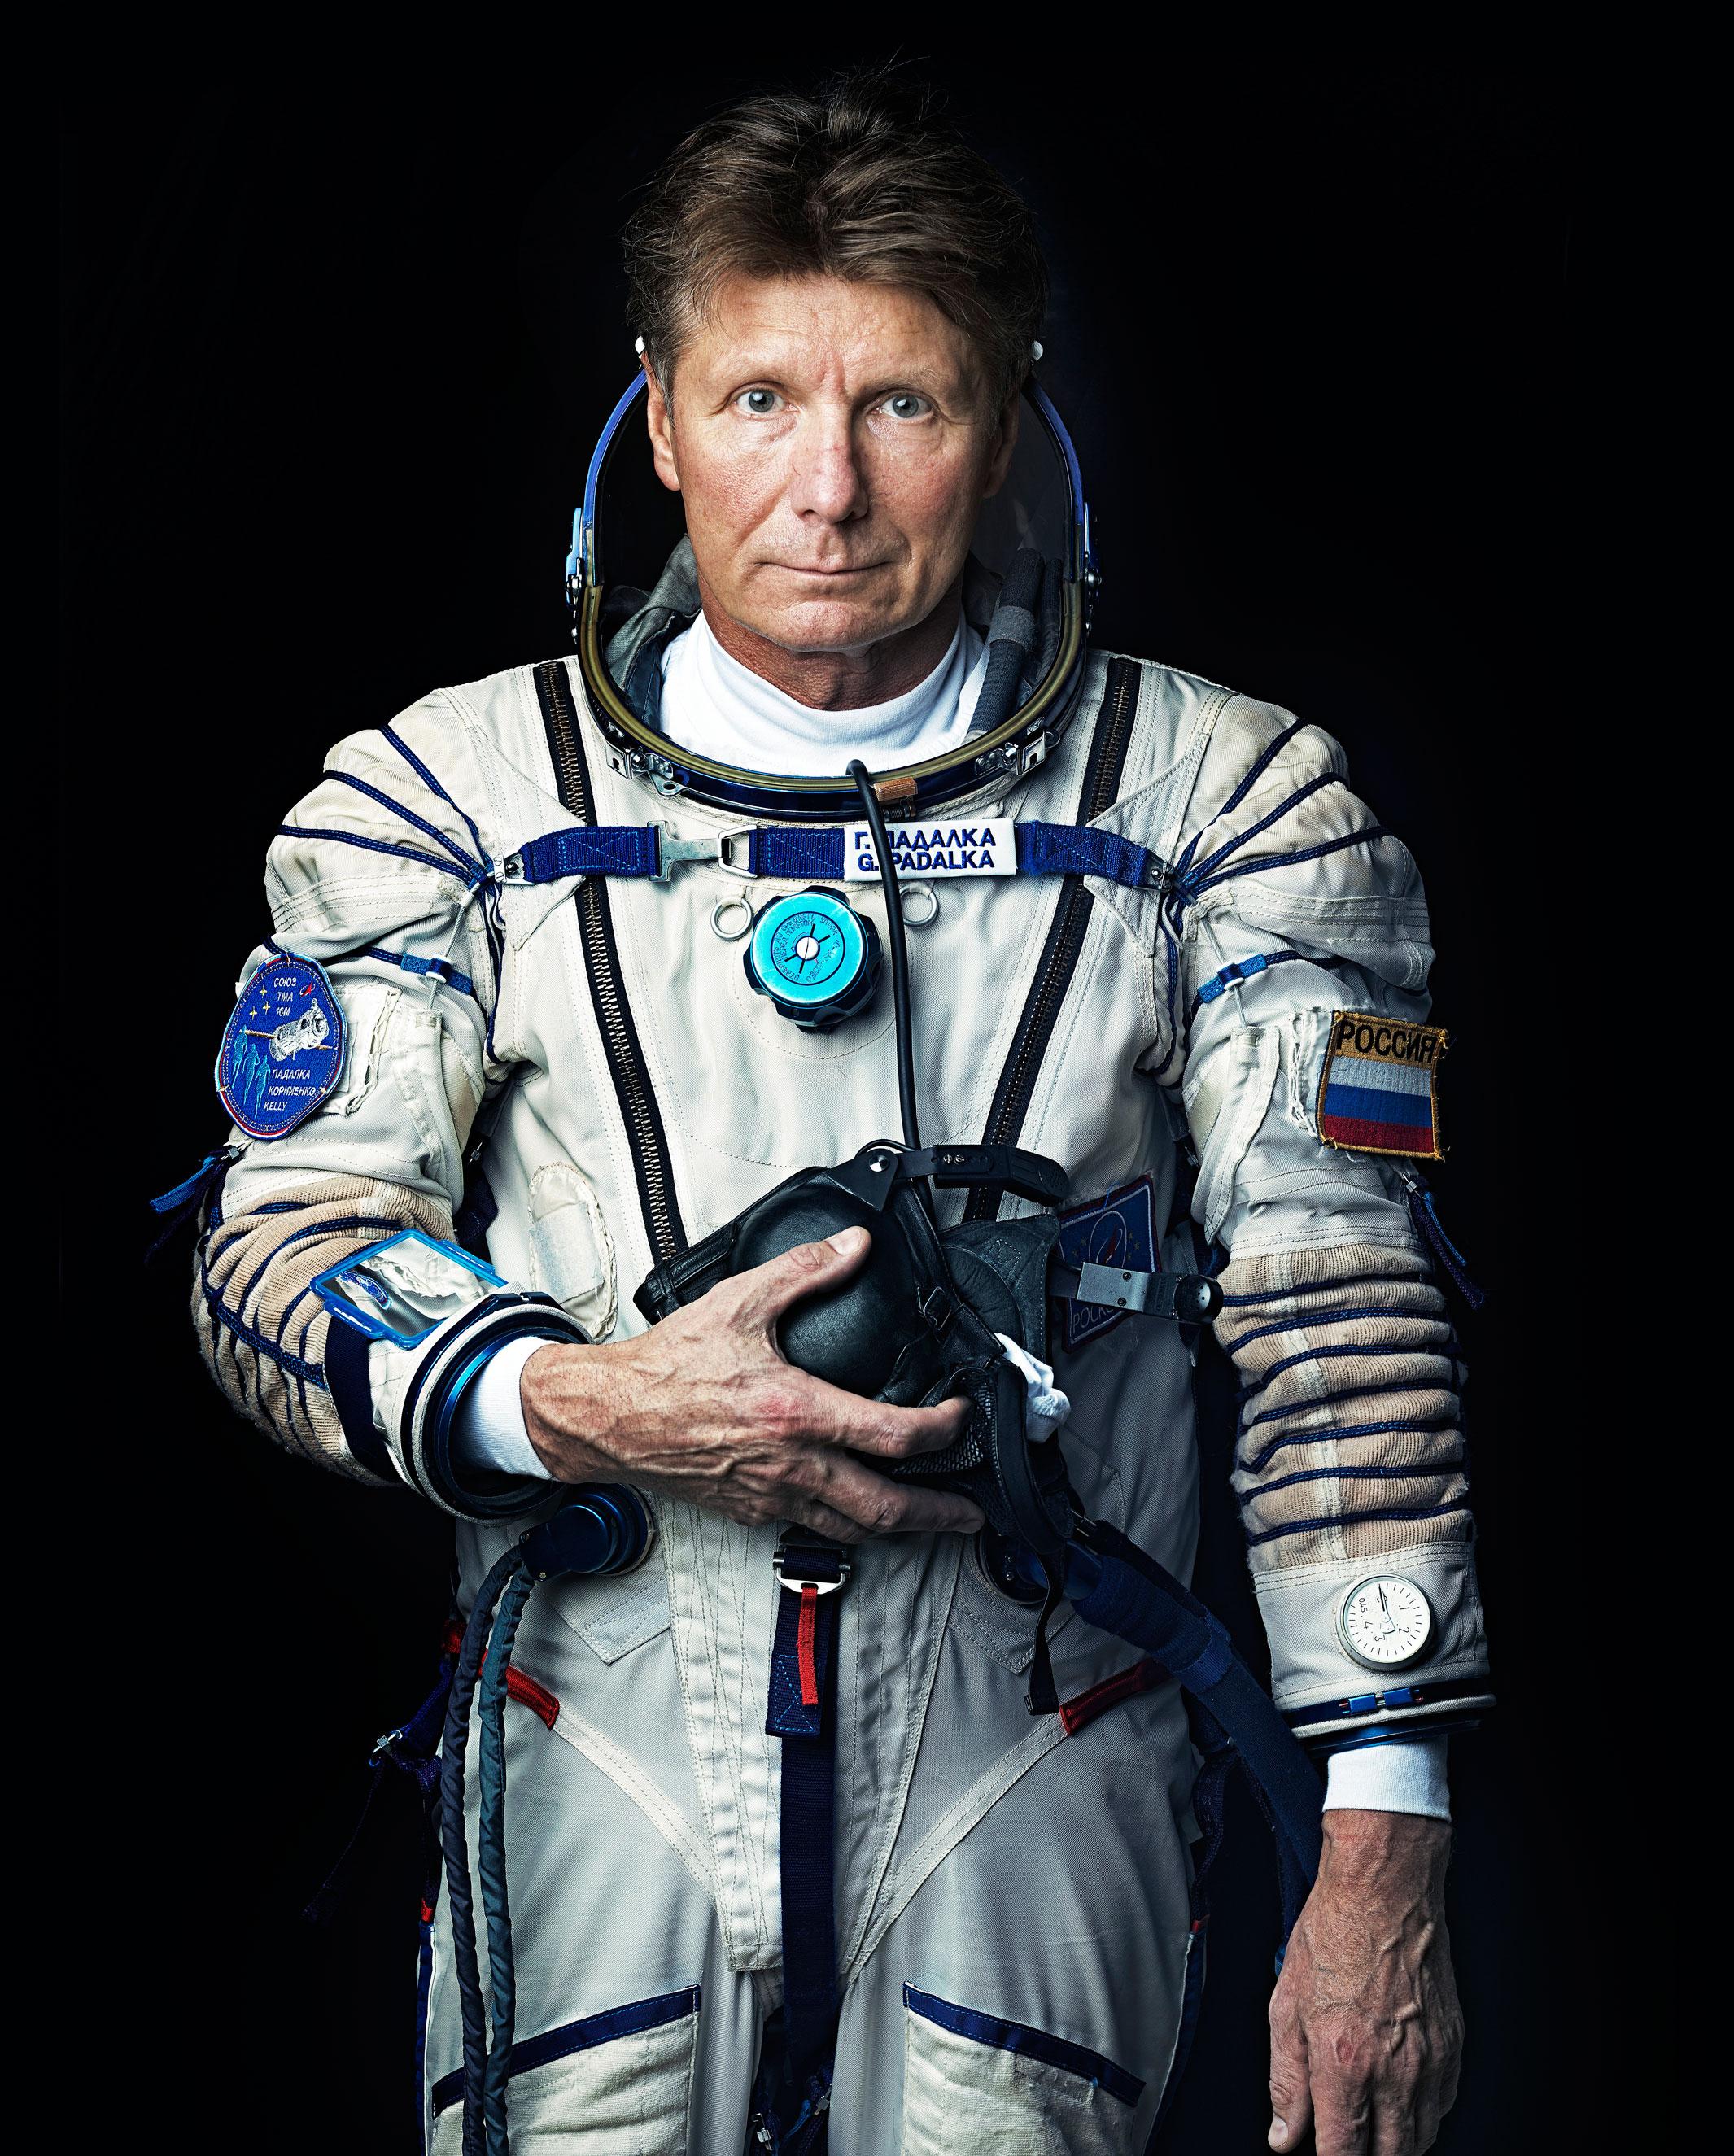 Russian Cosmonaut Gennady Padalka